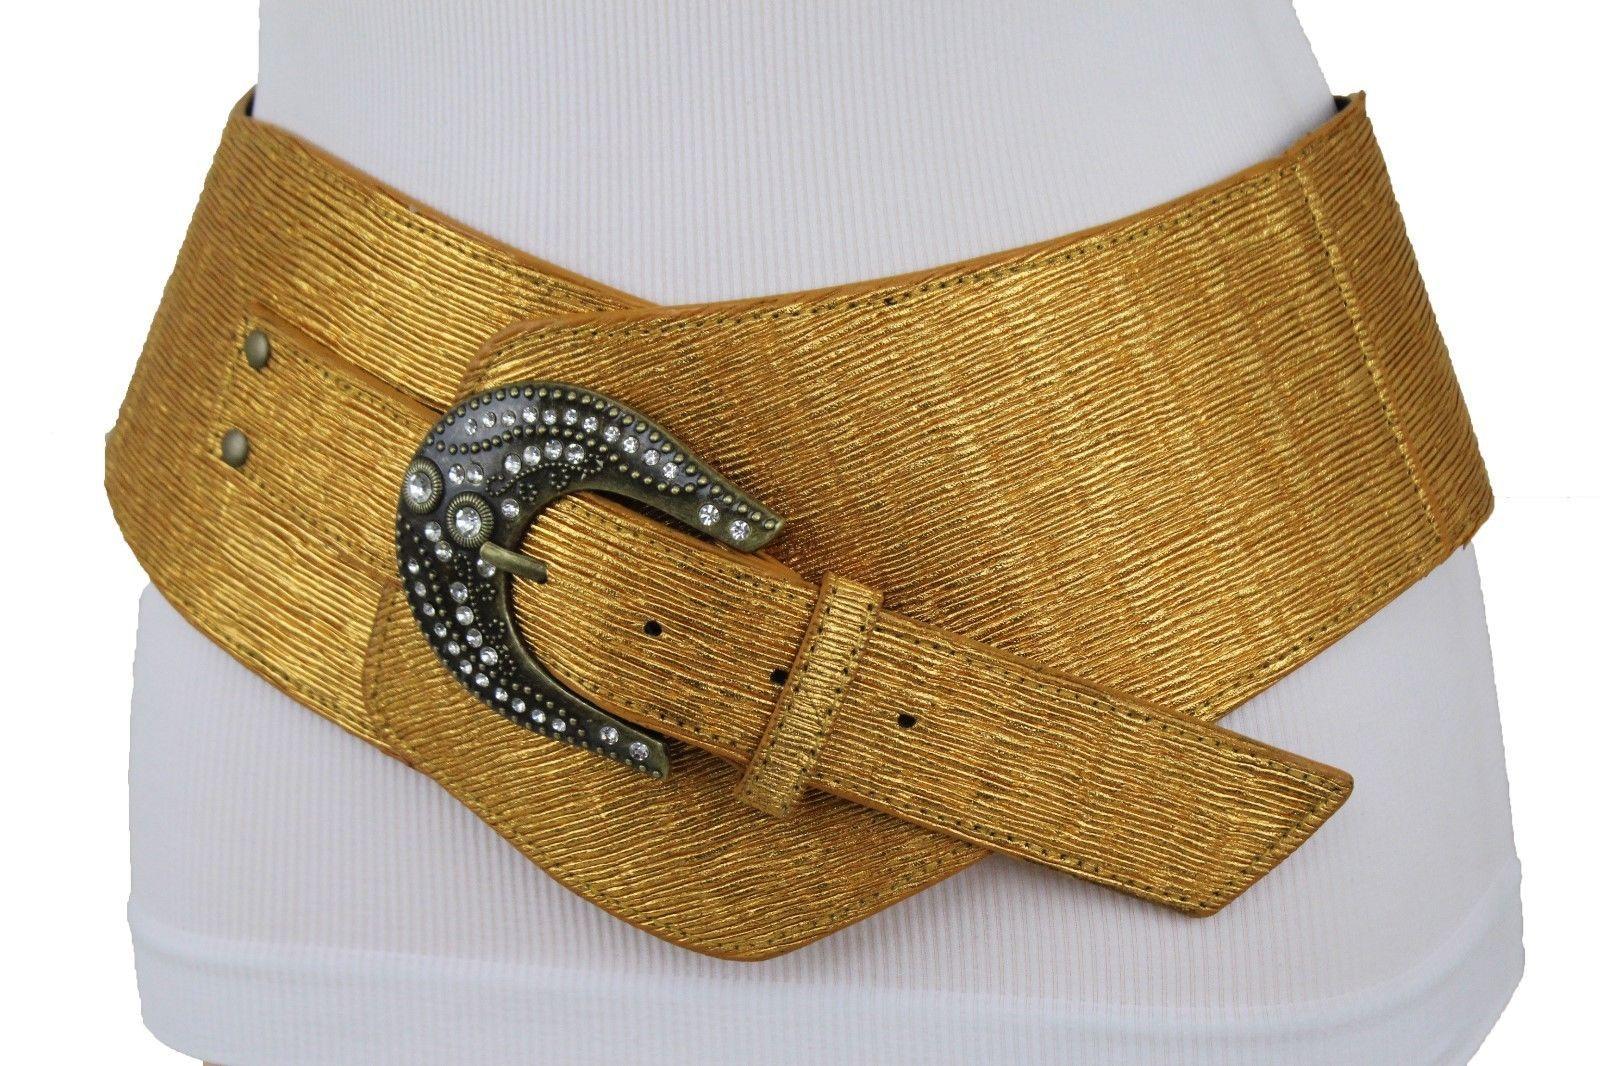 Süß Damen Breit Metallic Gold West Modischer Gürtel Hip Hohe Taille Bling